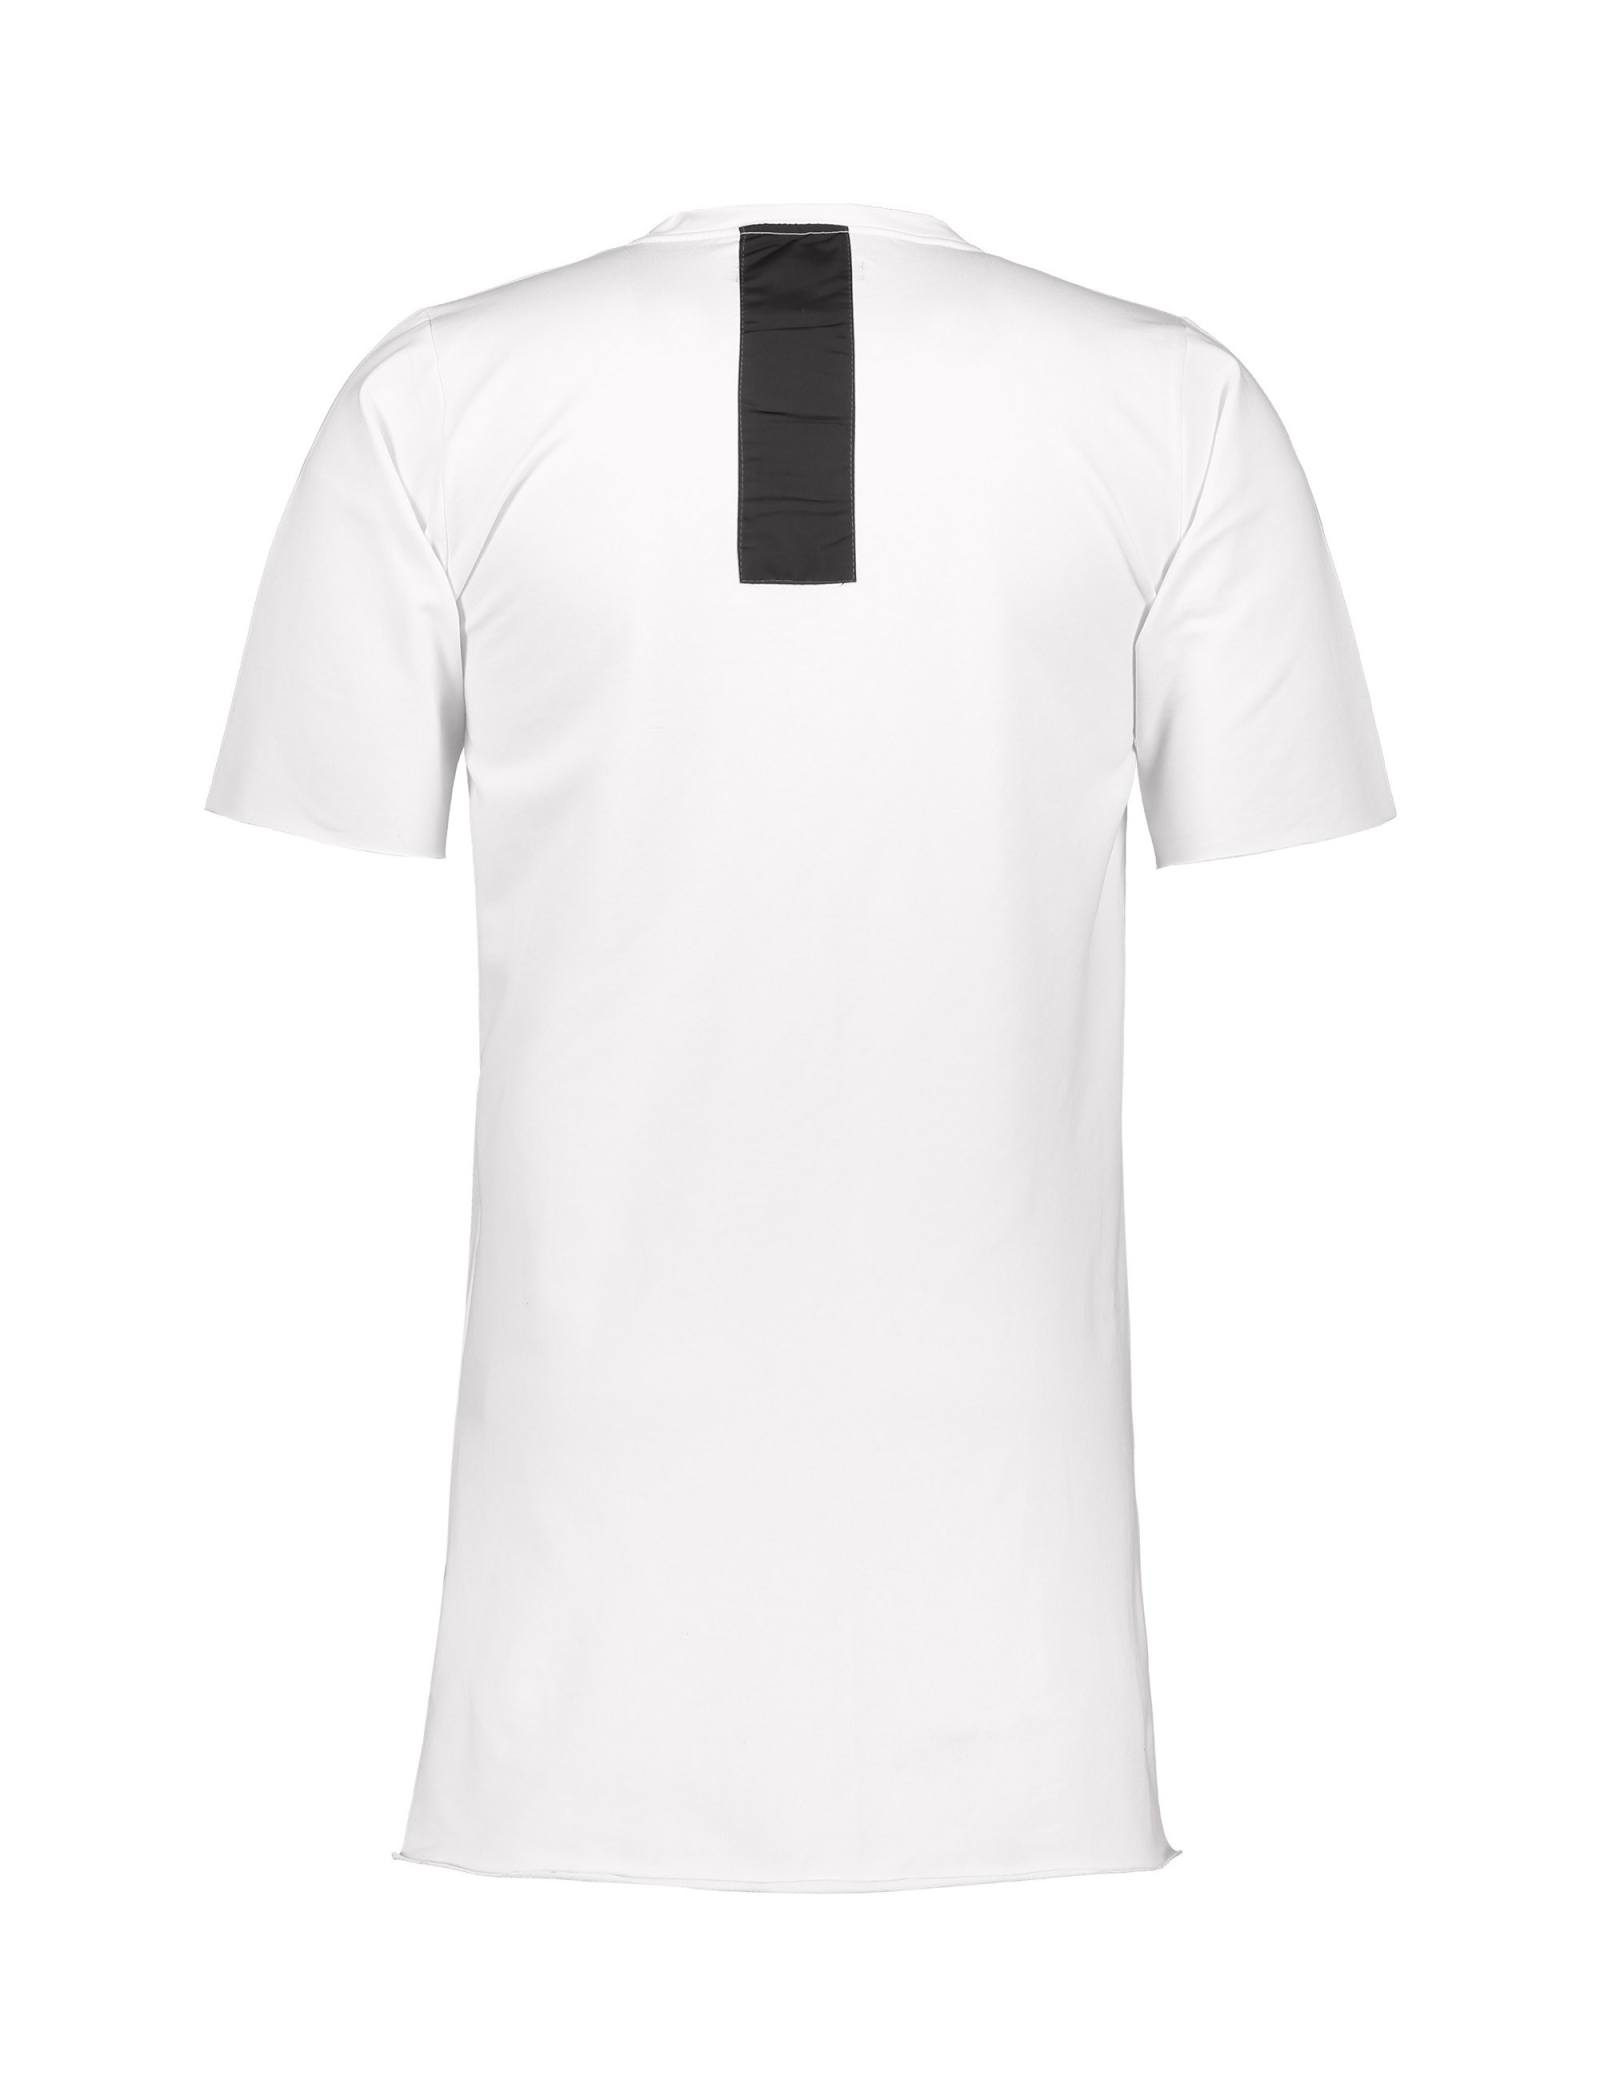 تی شرت ویسکوز یقه گرد مردانه Memory - یونیتی - سفيد - 2